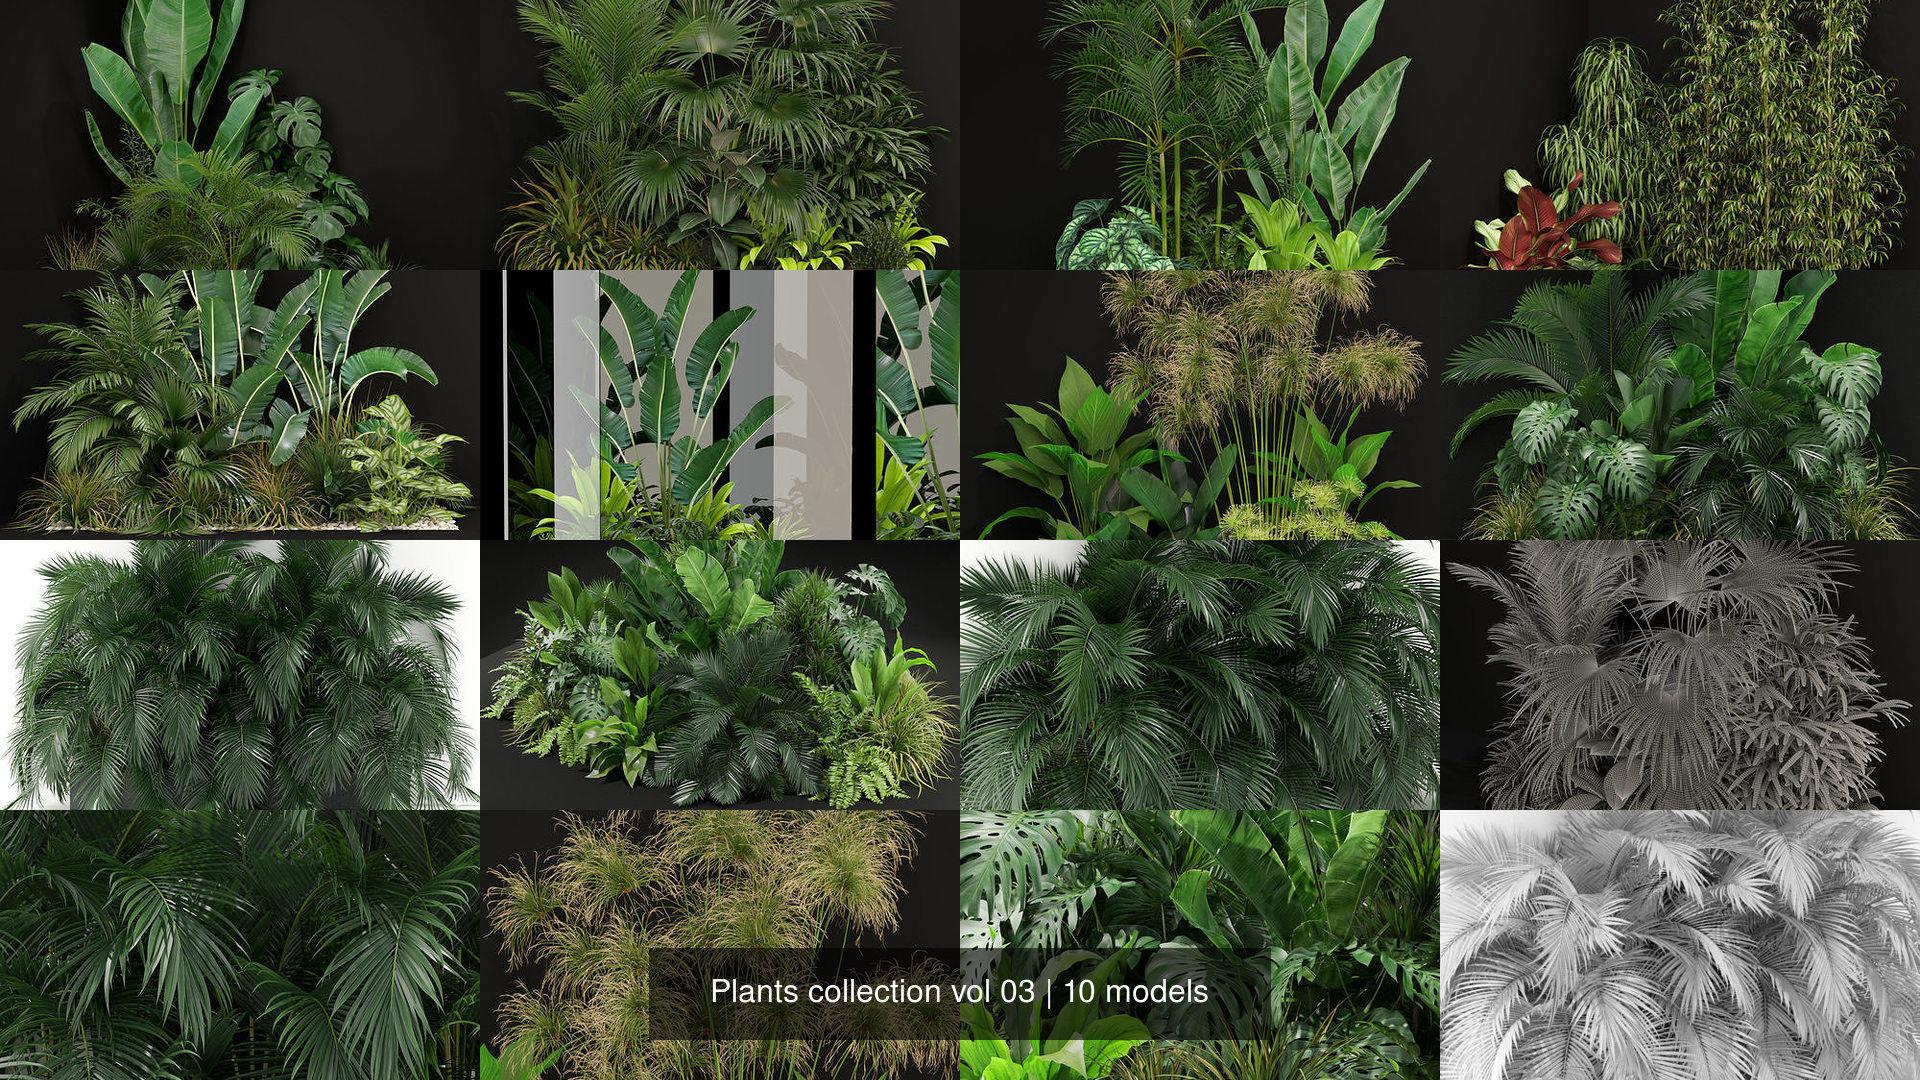 Plants collection vol 03